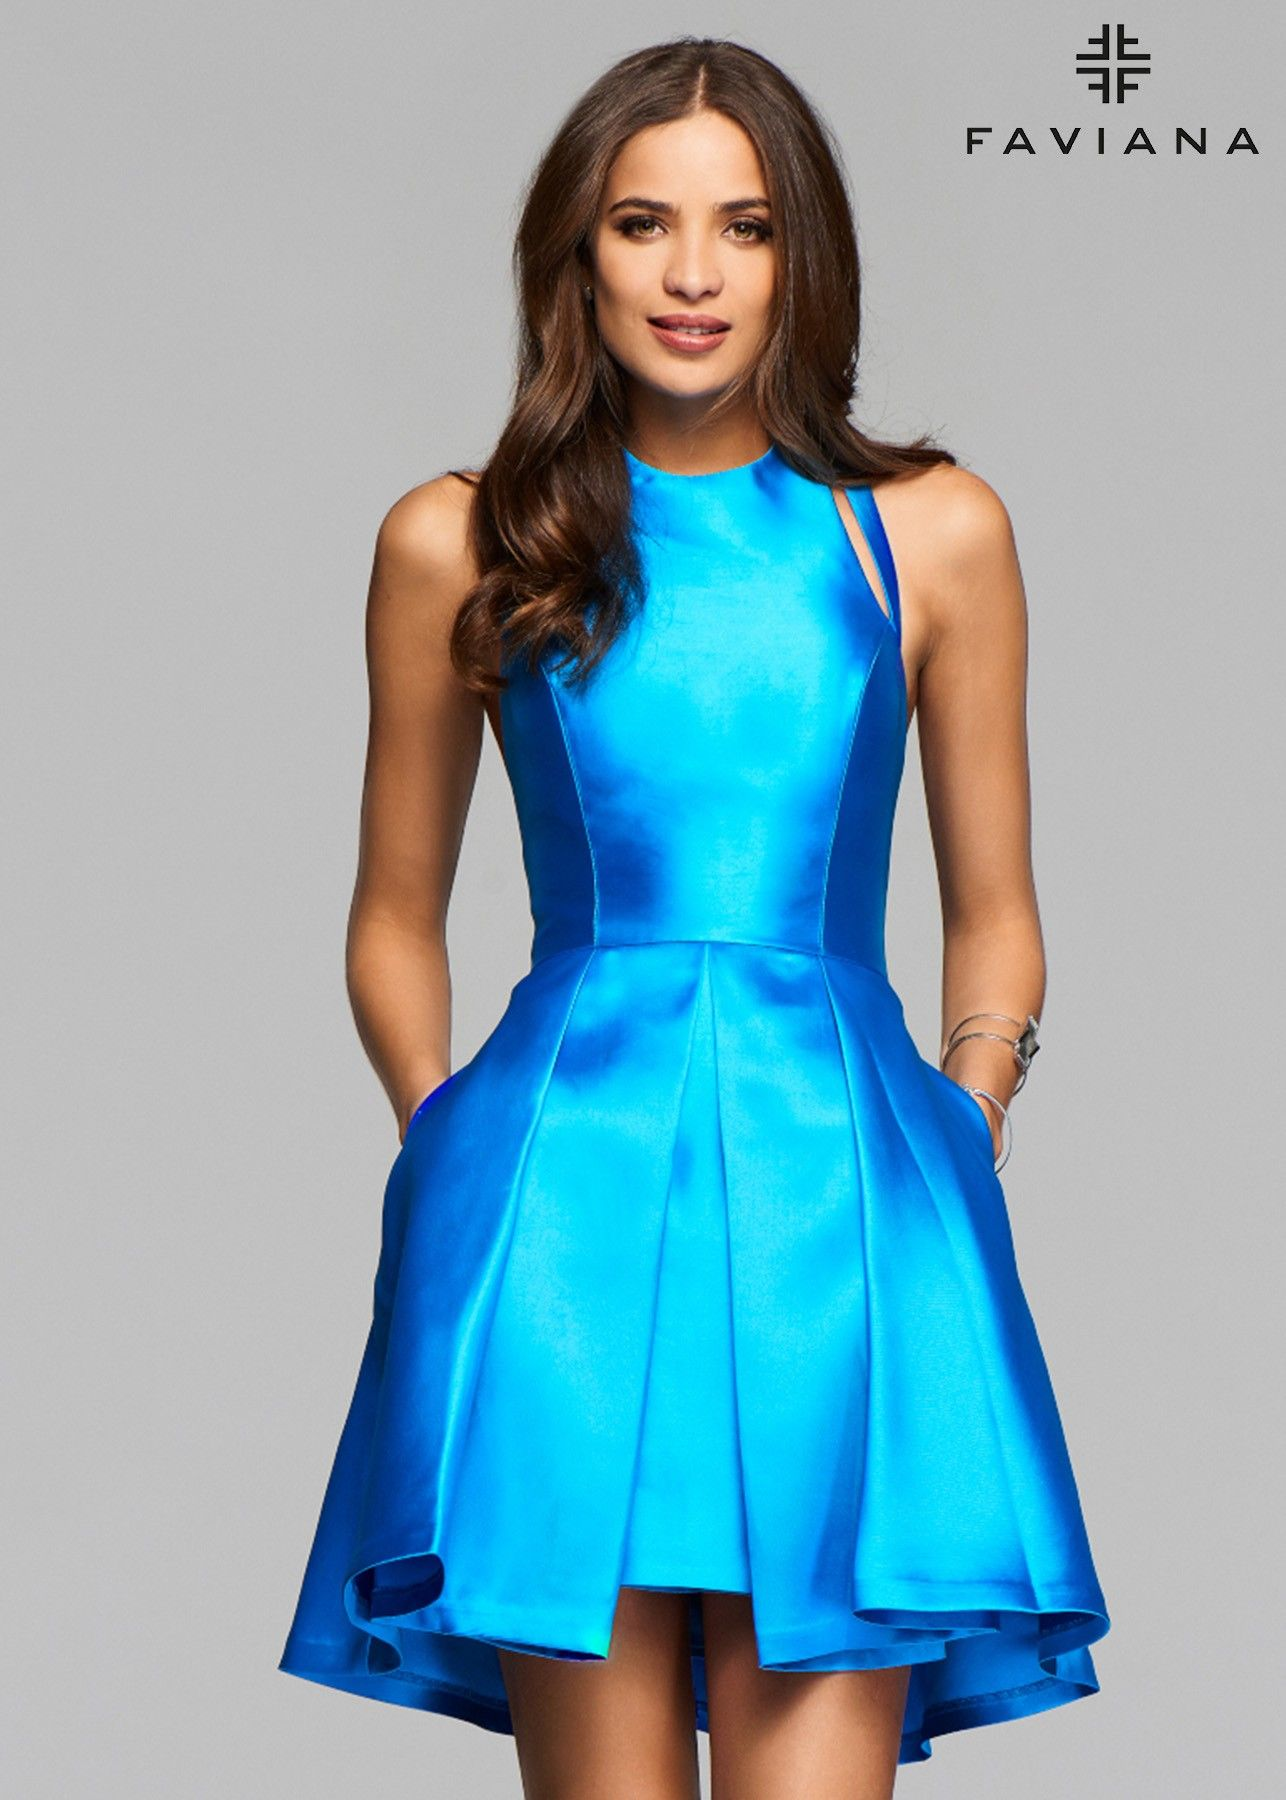 Faviana 7859 Short Dress | Blue satin dress, Blue satin and Satin ...